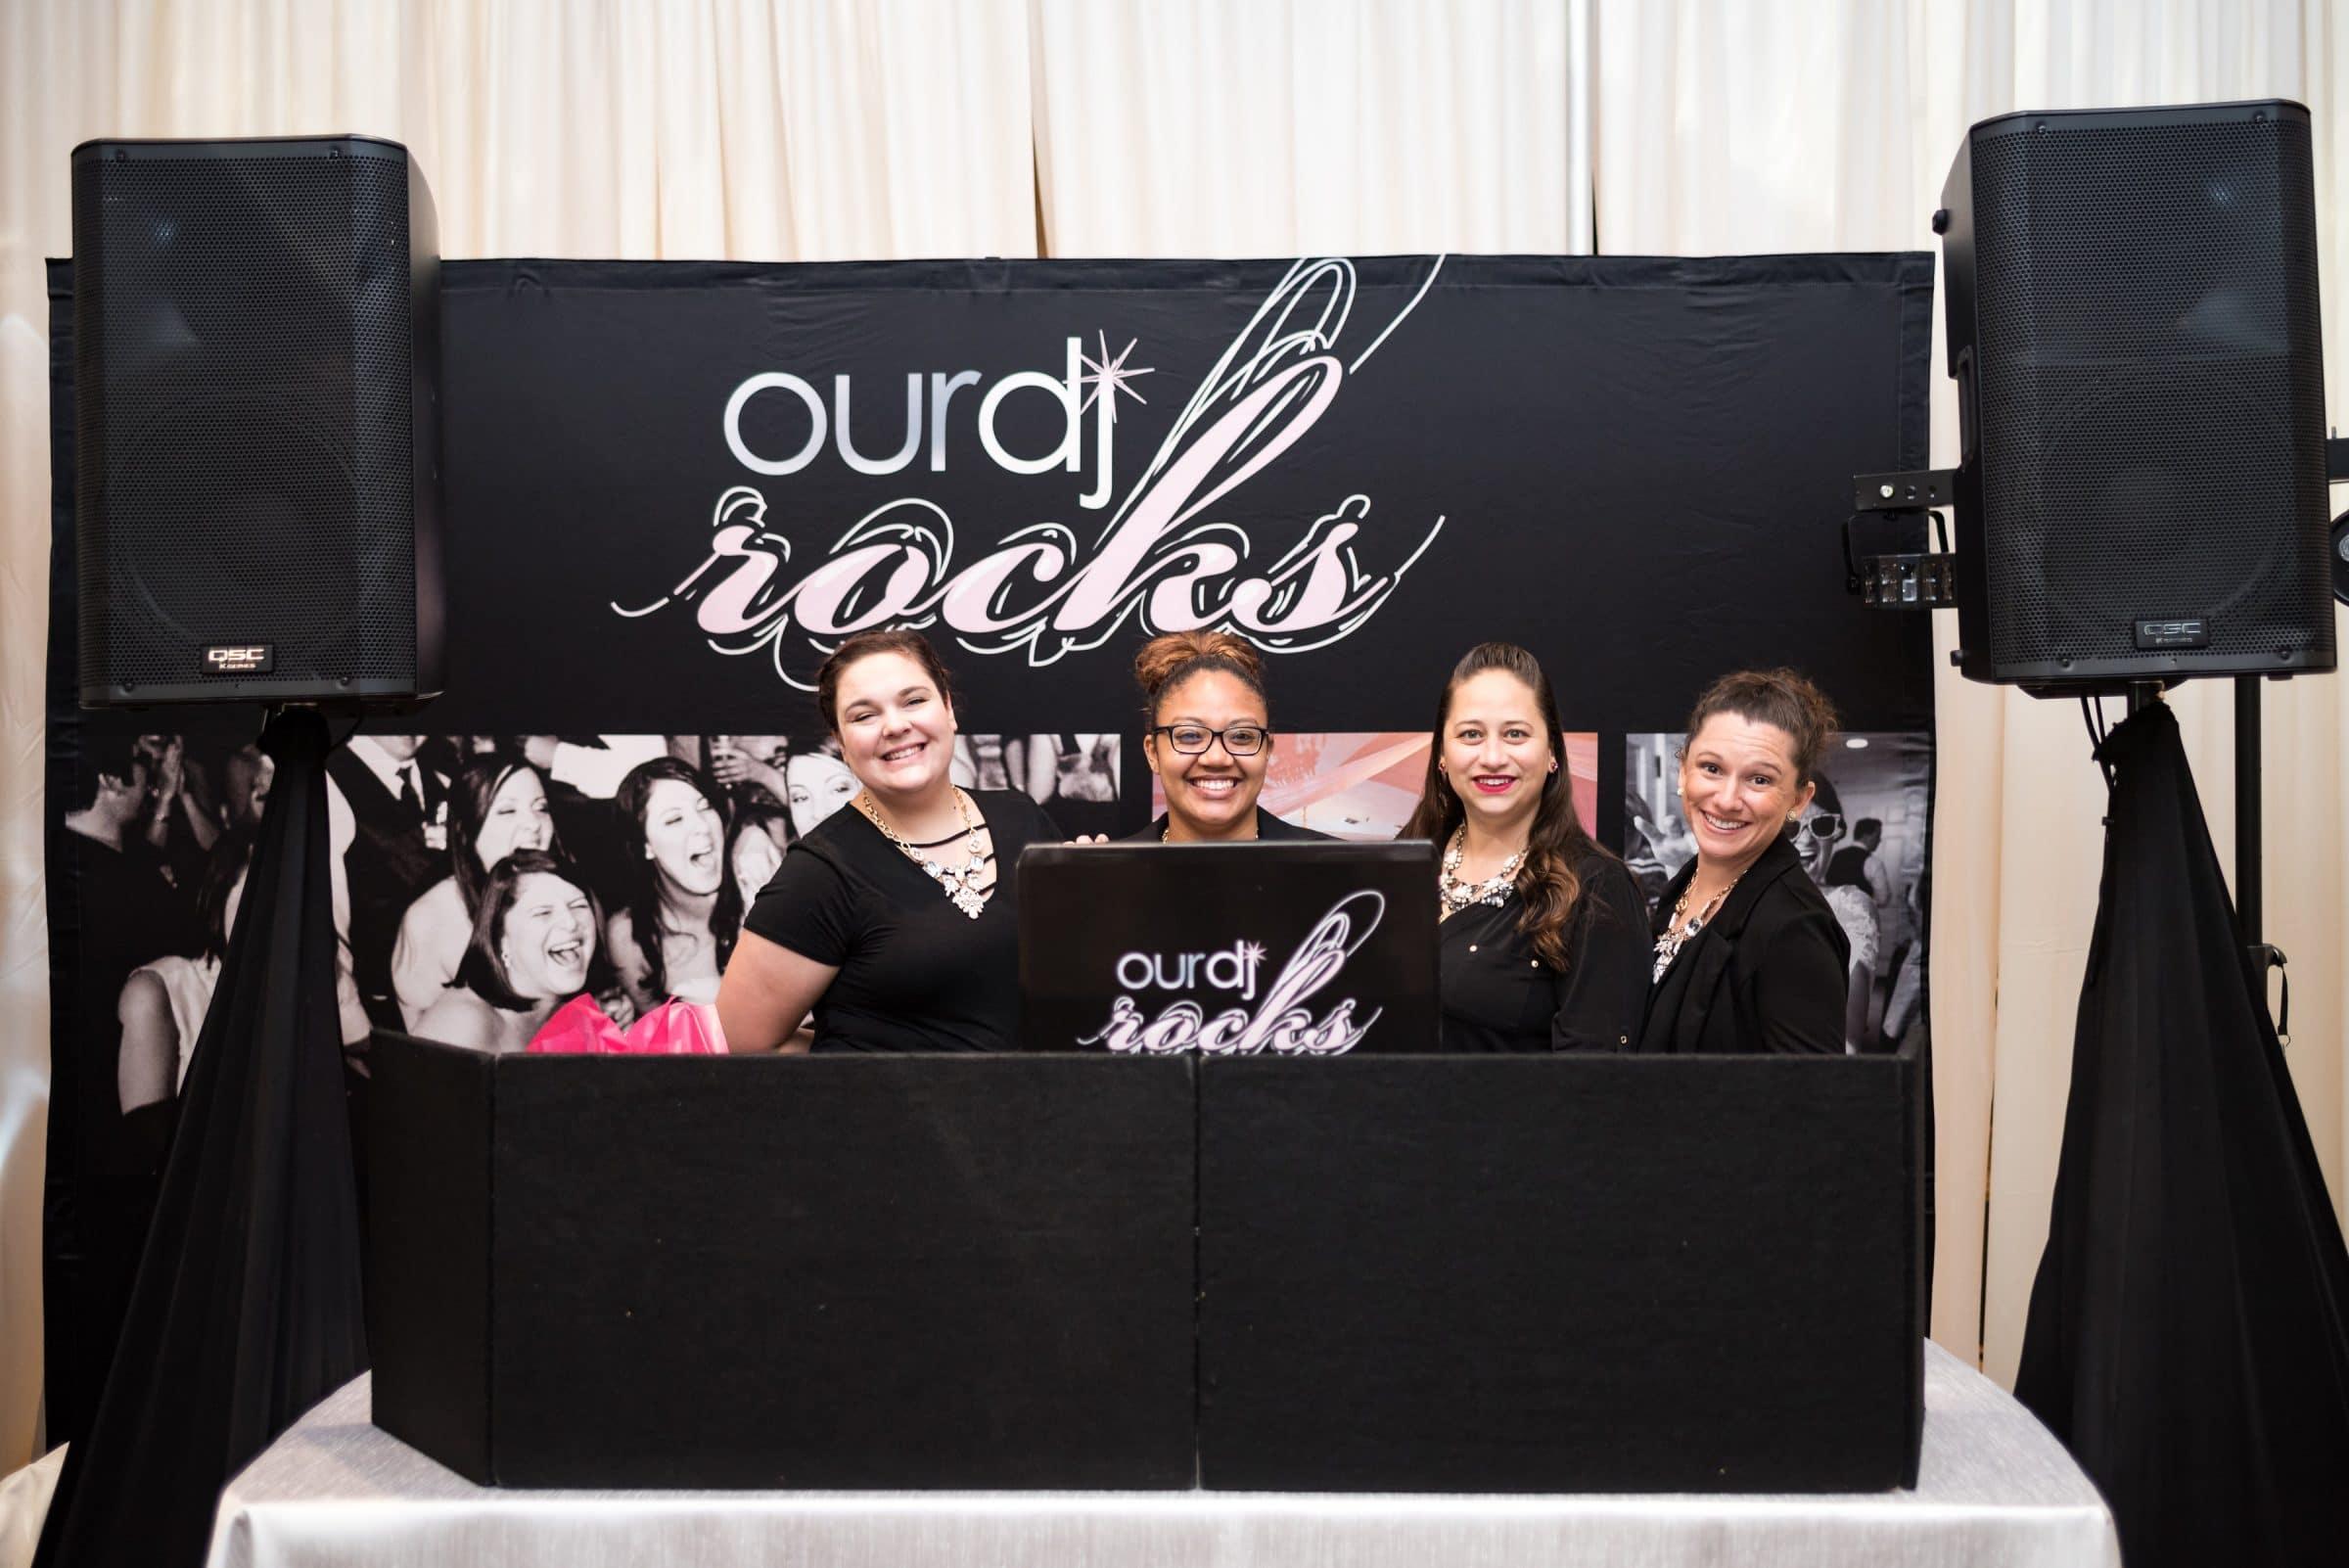 Our DJ Rocks Wedding Show Booth with Four Female DJS